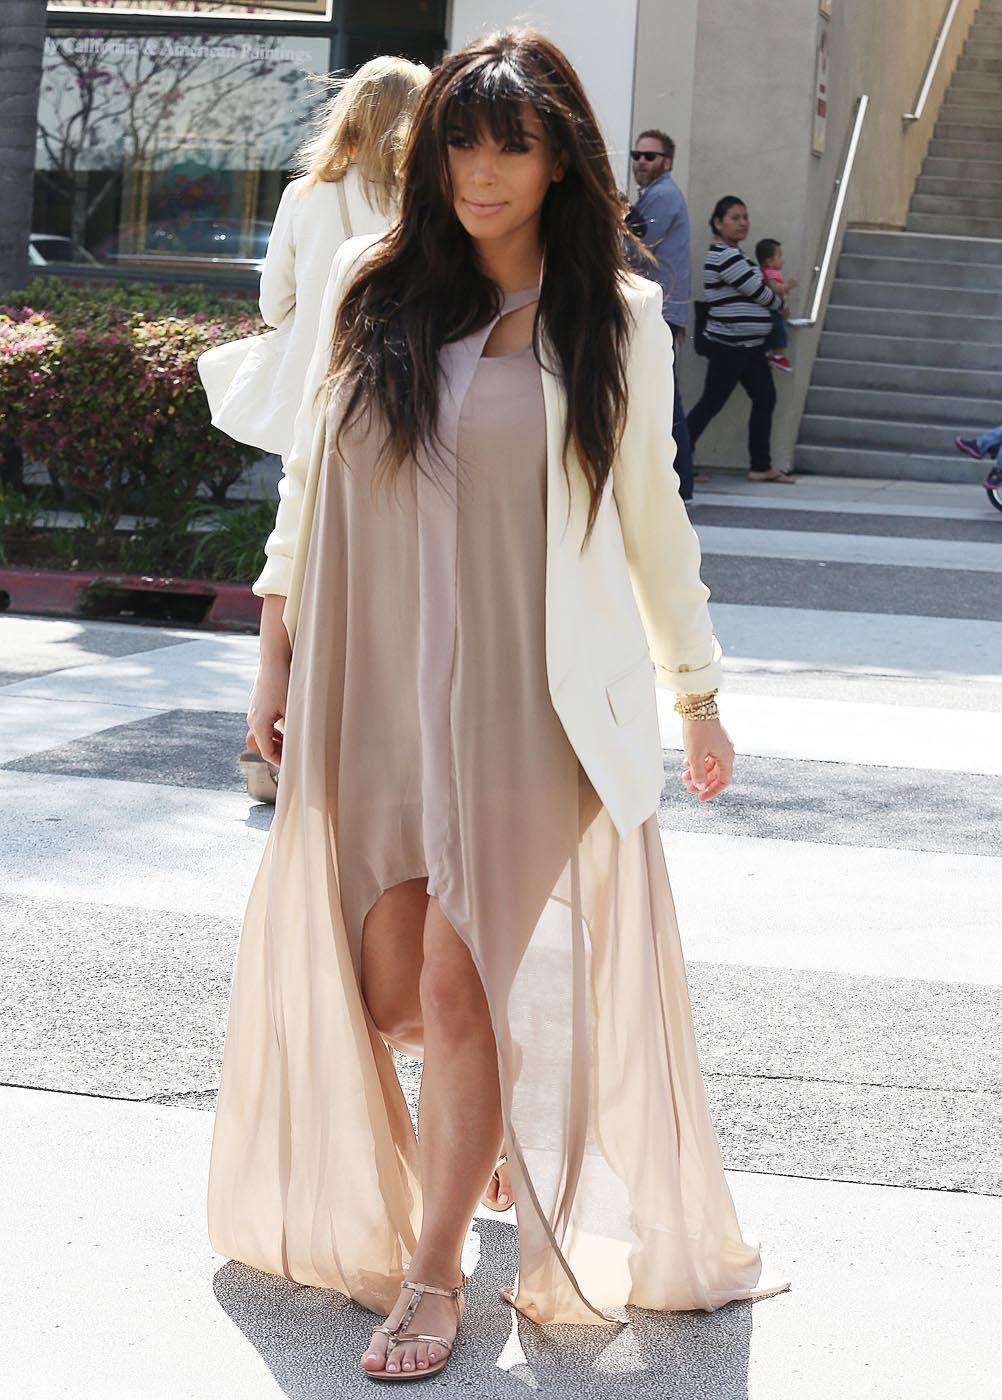 Kim Kardashian love this dress with the blazer and nudes